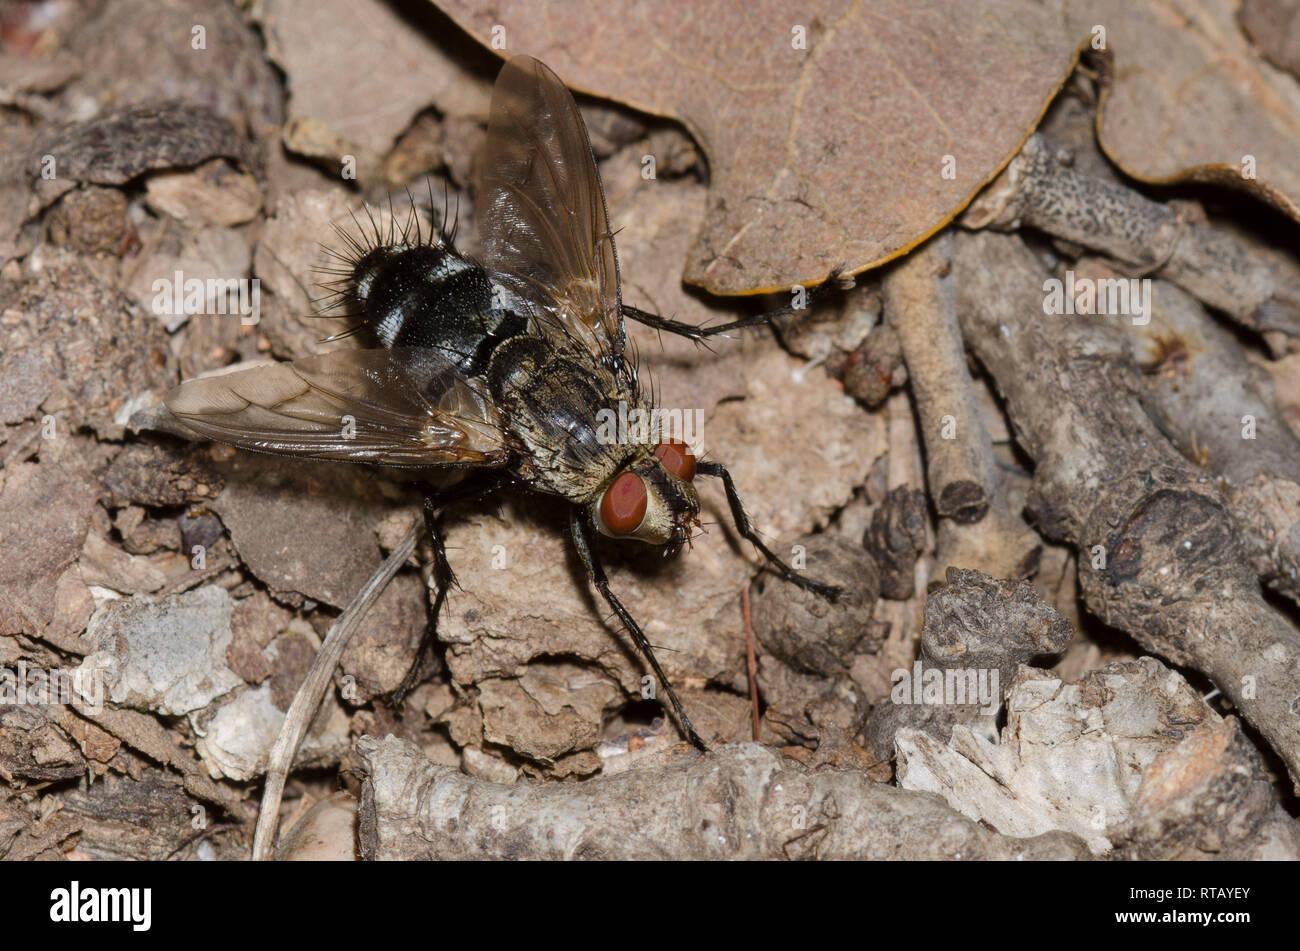 Tachinid Fly, Family Tachinidae, male Stock Photo